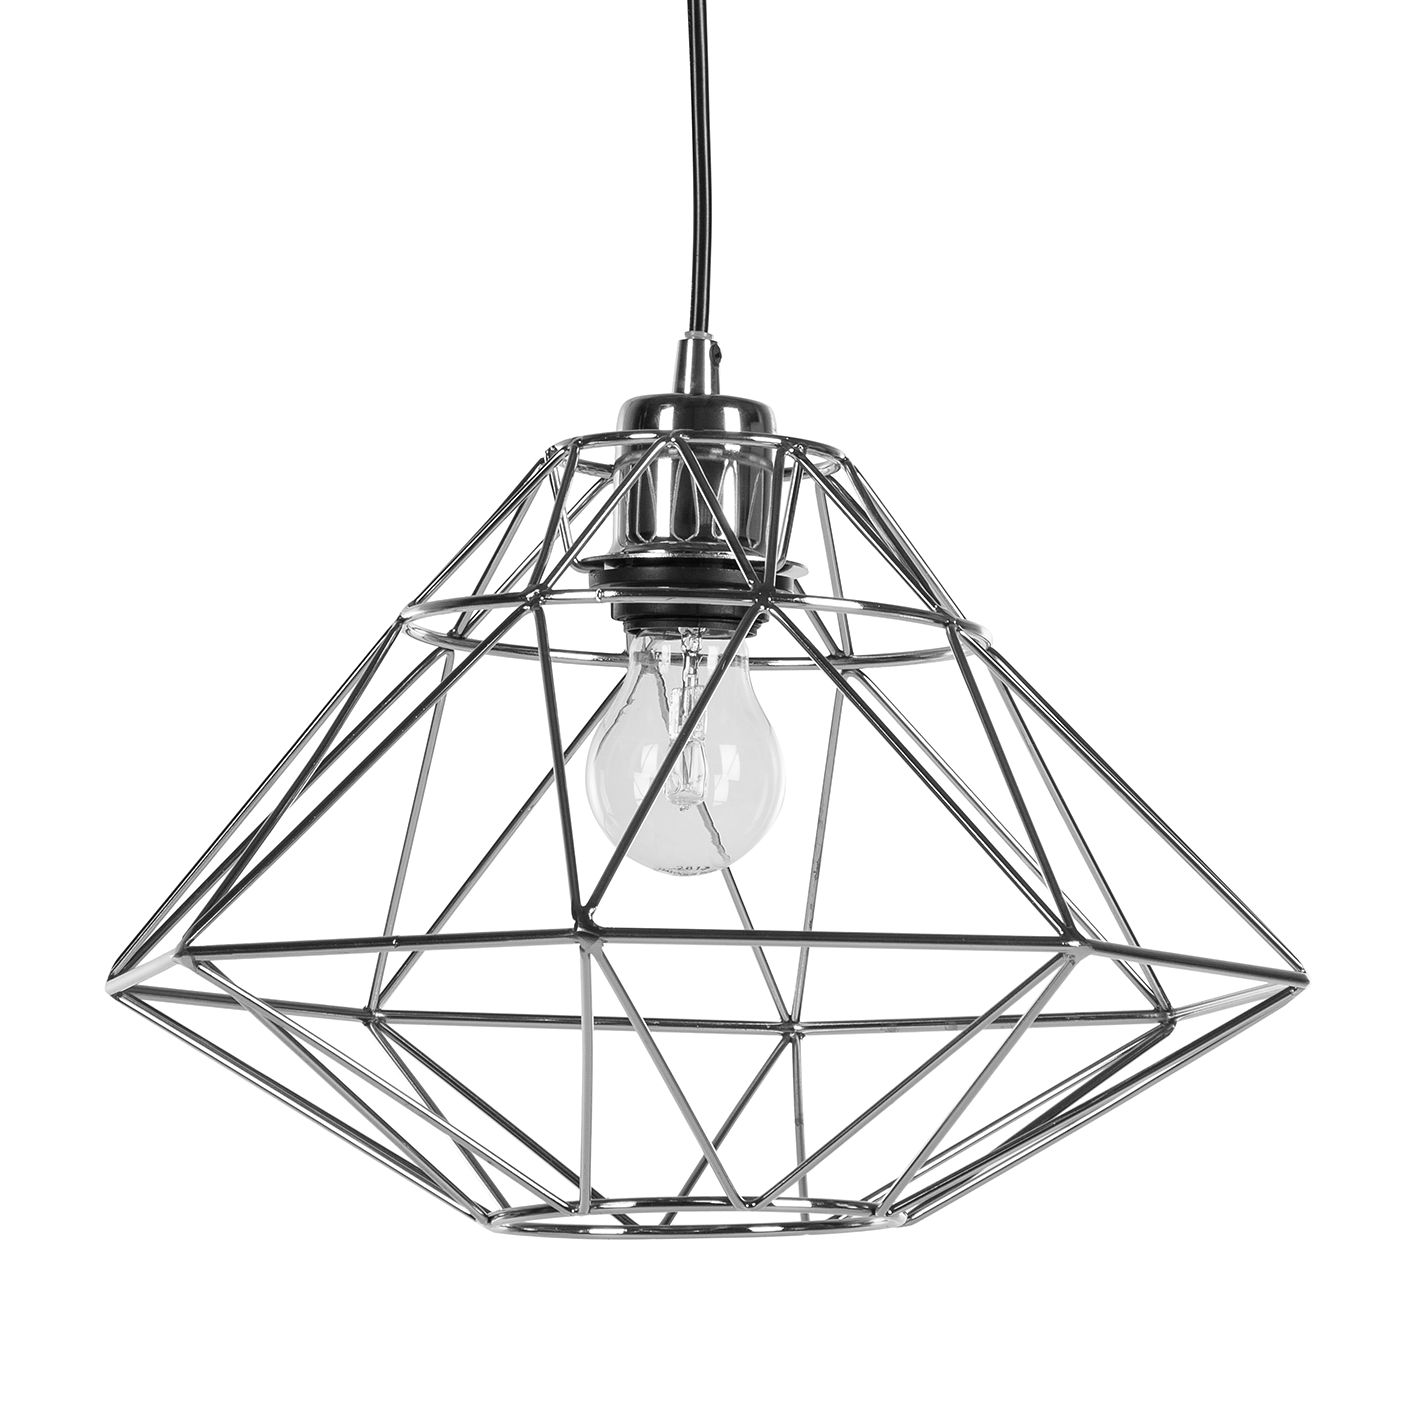 pendelleuchte ainikki ii metall 1 flammig loistaa a. Black Bedroom Furniture Sets. Home Design Ideas